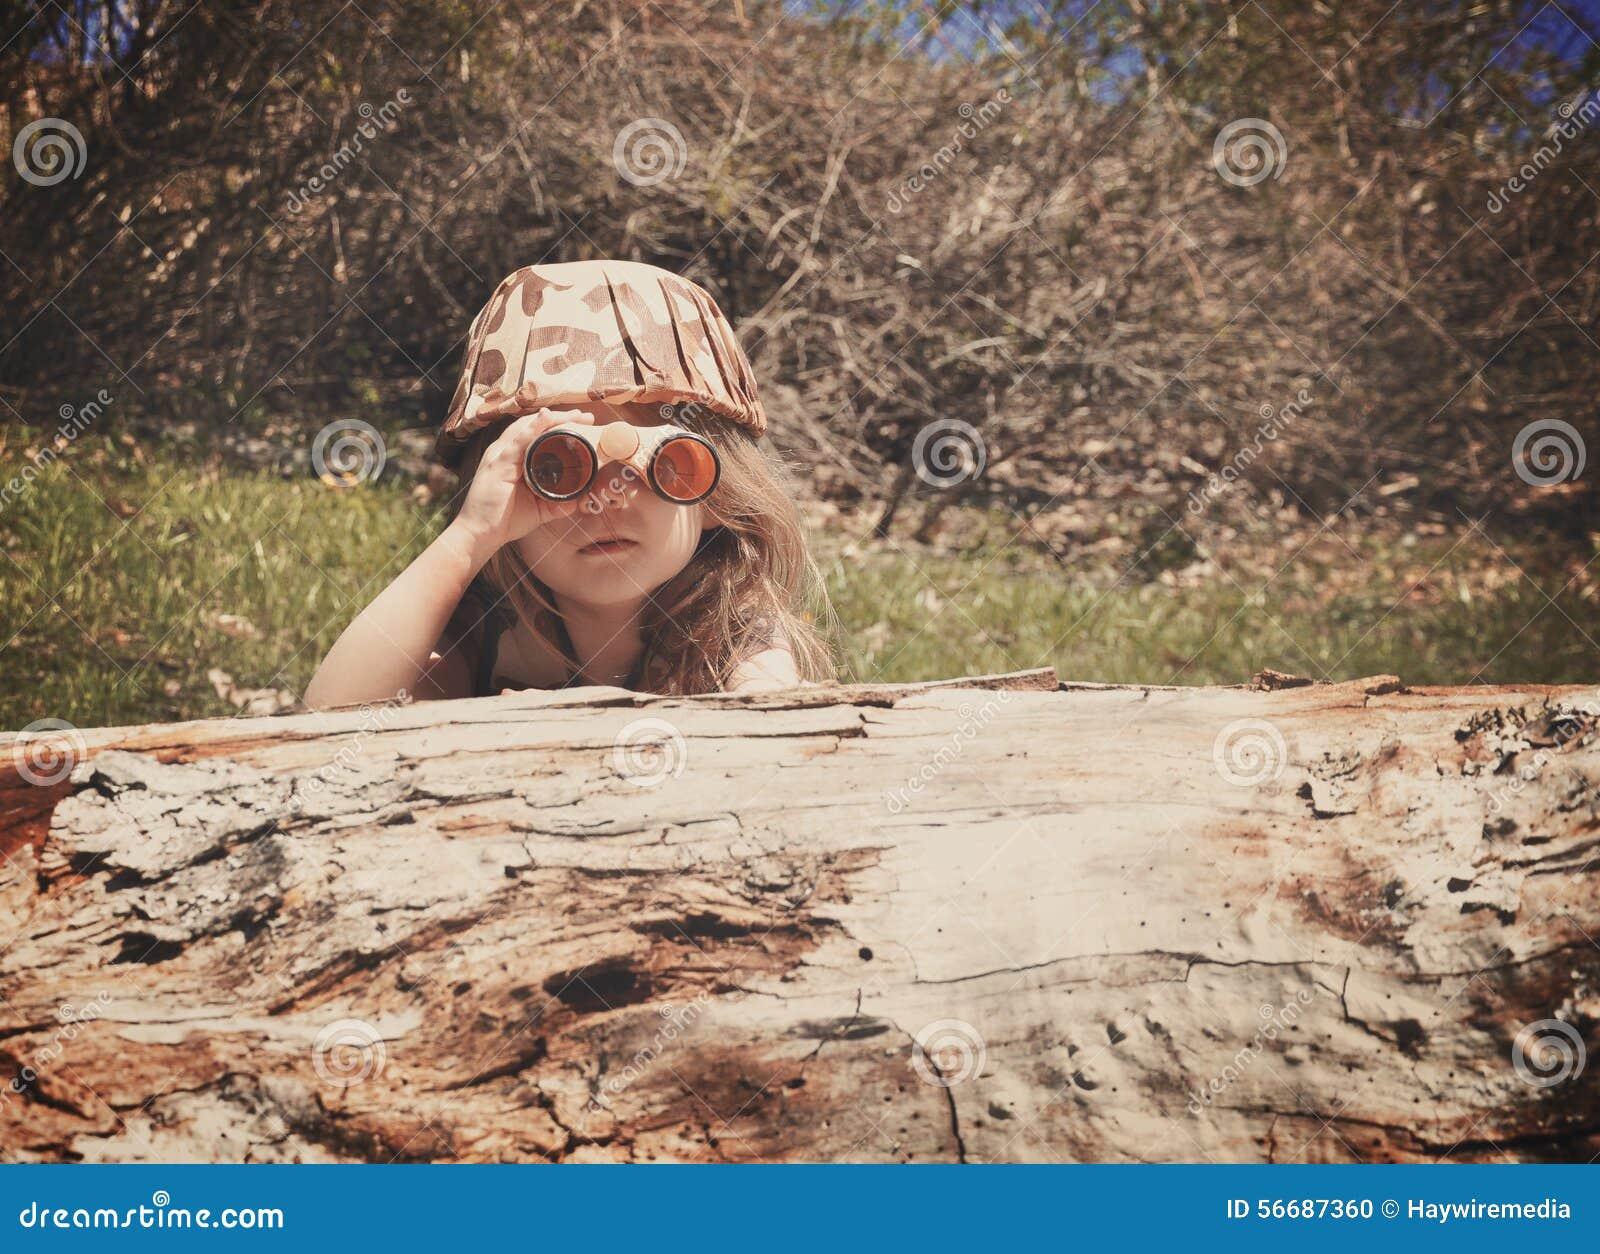 Child Exploring in Woods